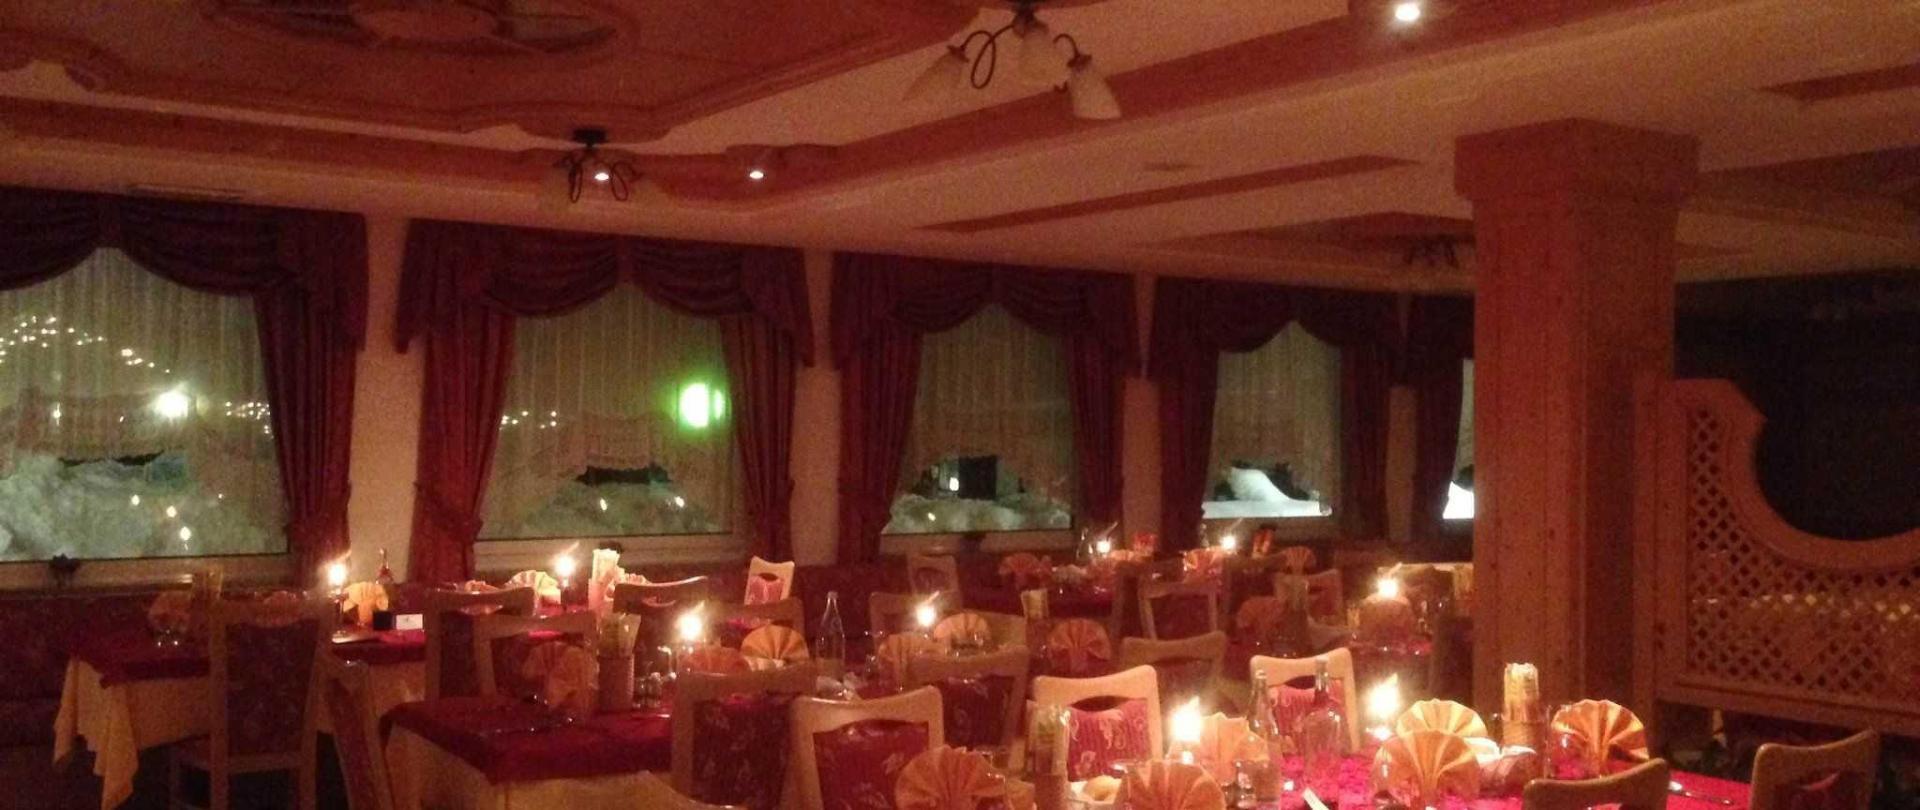 Restaurant Dolomiti Hotel Olimpia.JPG